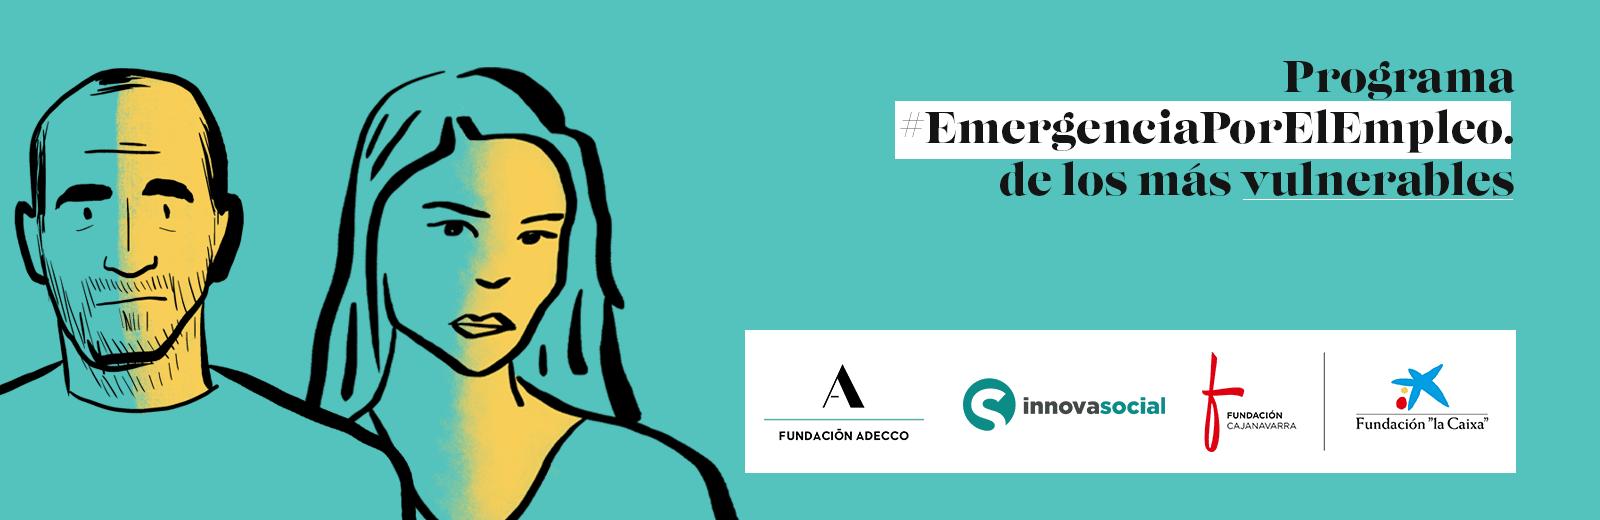 programa #EmergenciaPorElEmpleo Navarra